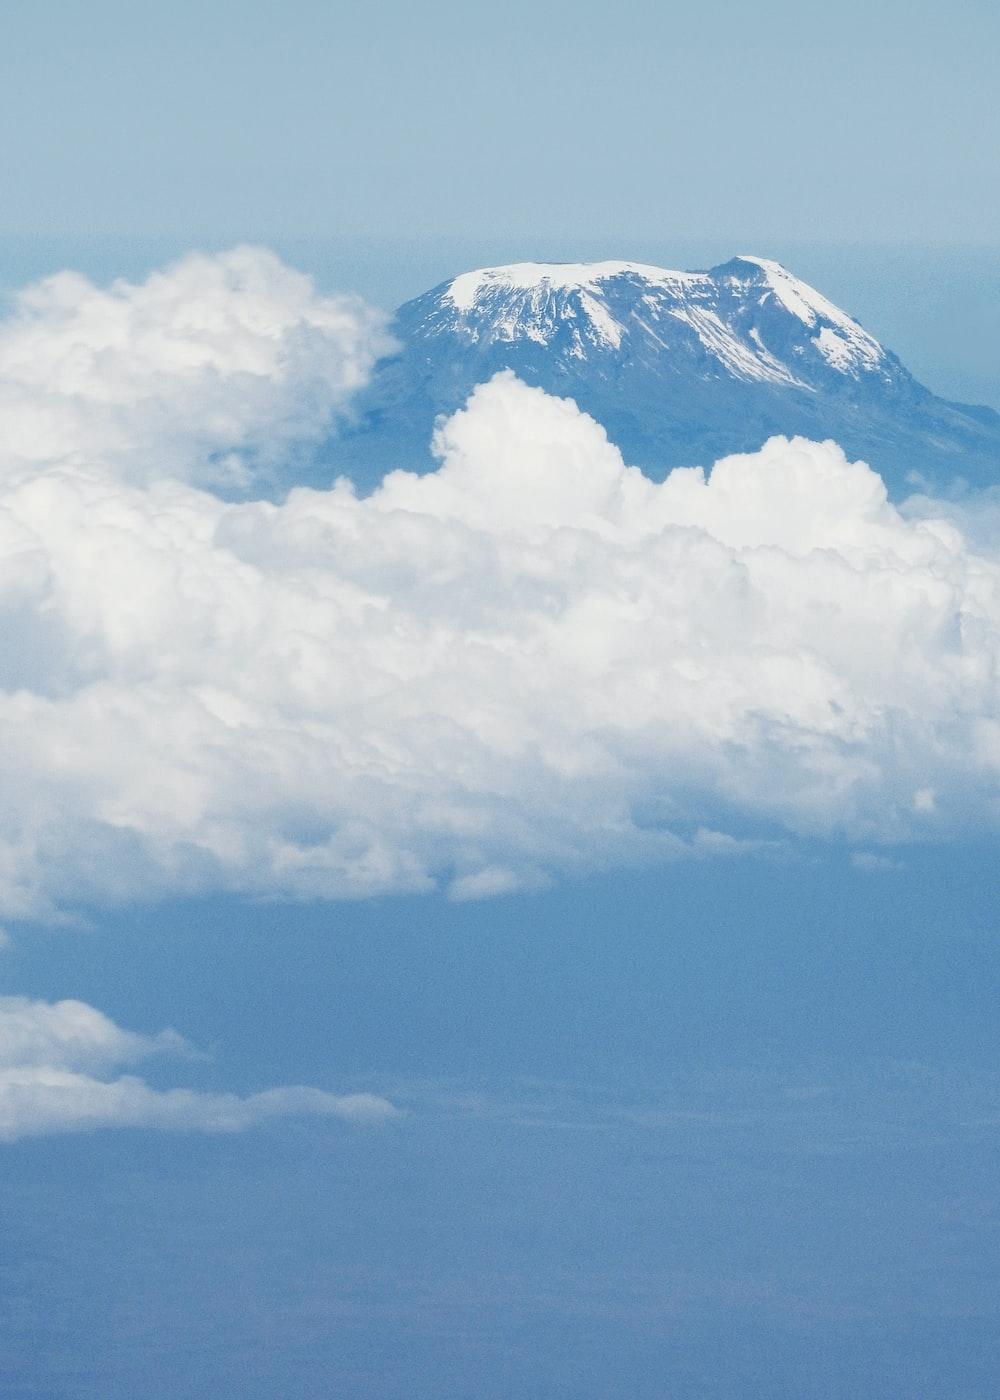 landscape photography of summit